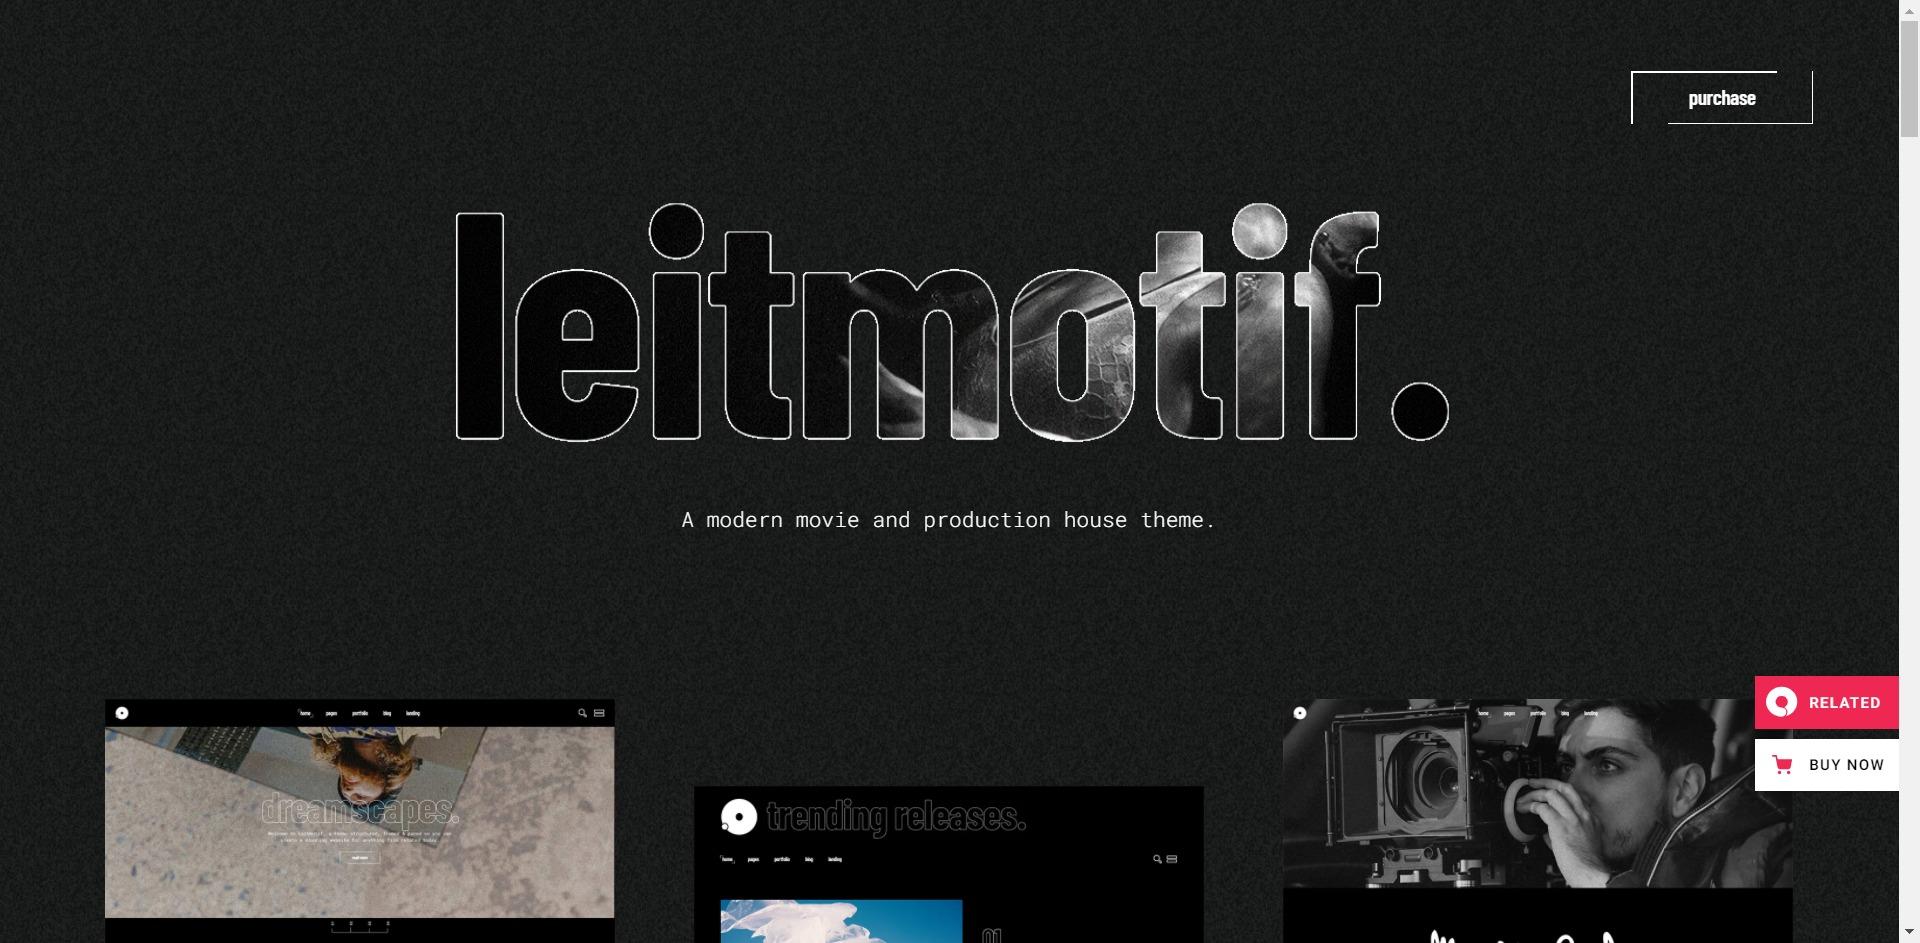 Leitmotif - 电影视频剪切编辑主播WordPress主题